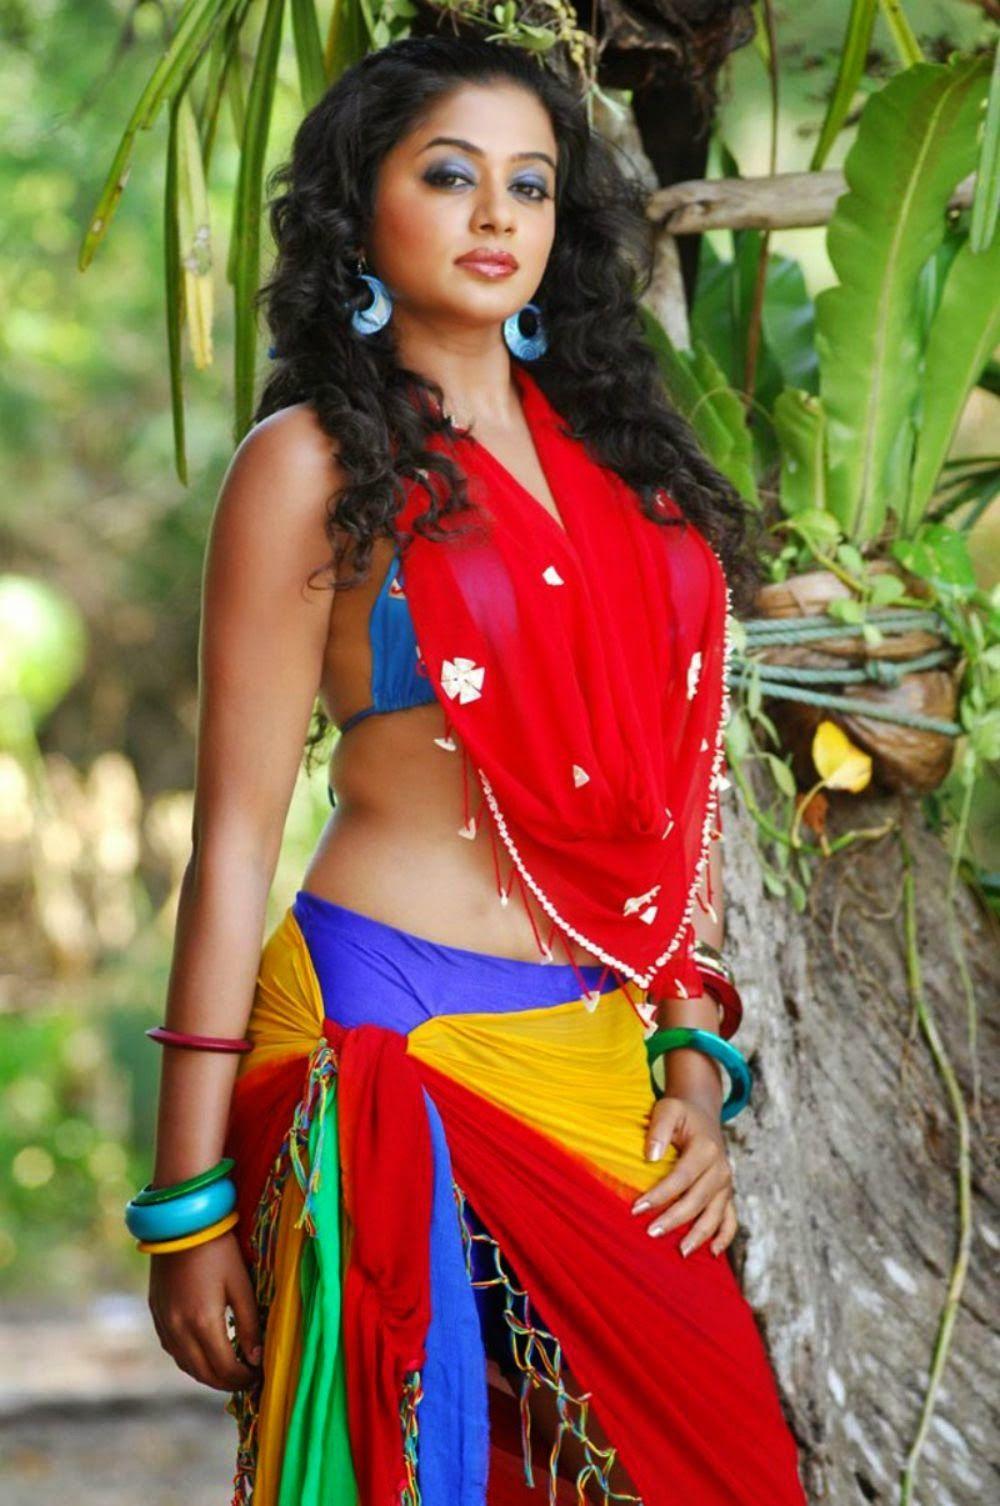 Latest Priyamani Hd Hot Photos Mallu Actress Priyamani Sensational Photo Collection Priyamani Shows Her Big Boobs In Bikini Priyamani Sexy Navel Photos